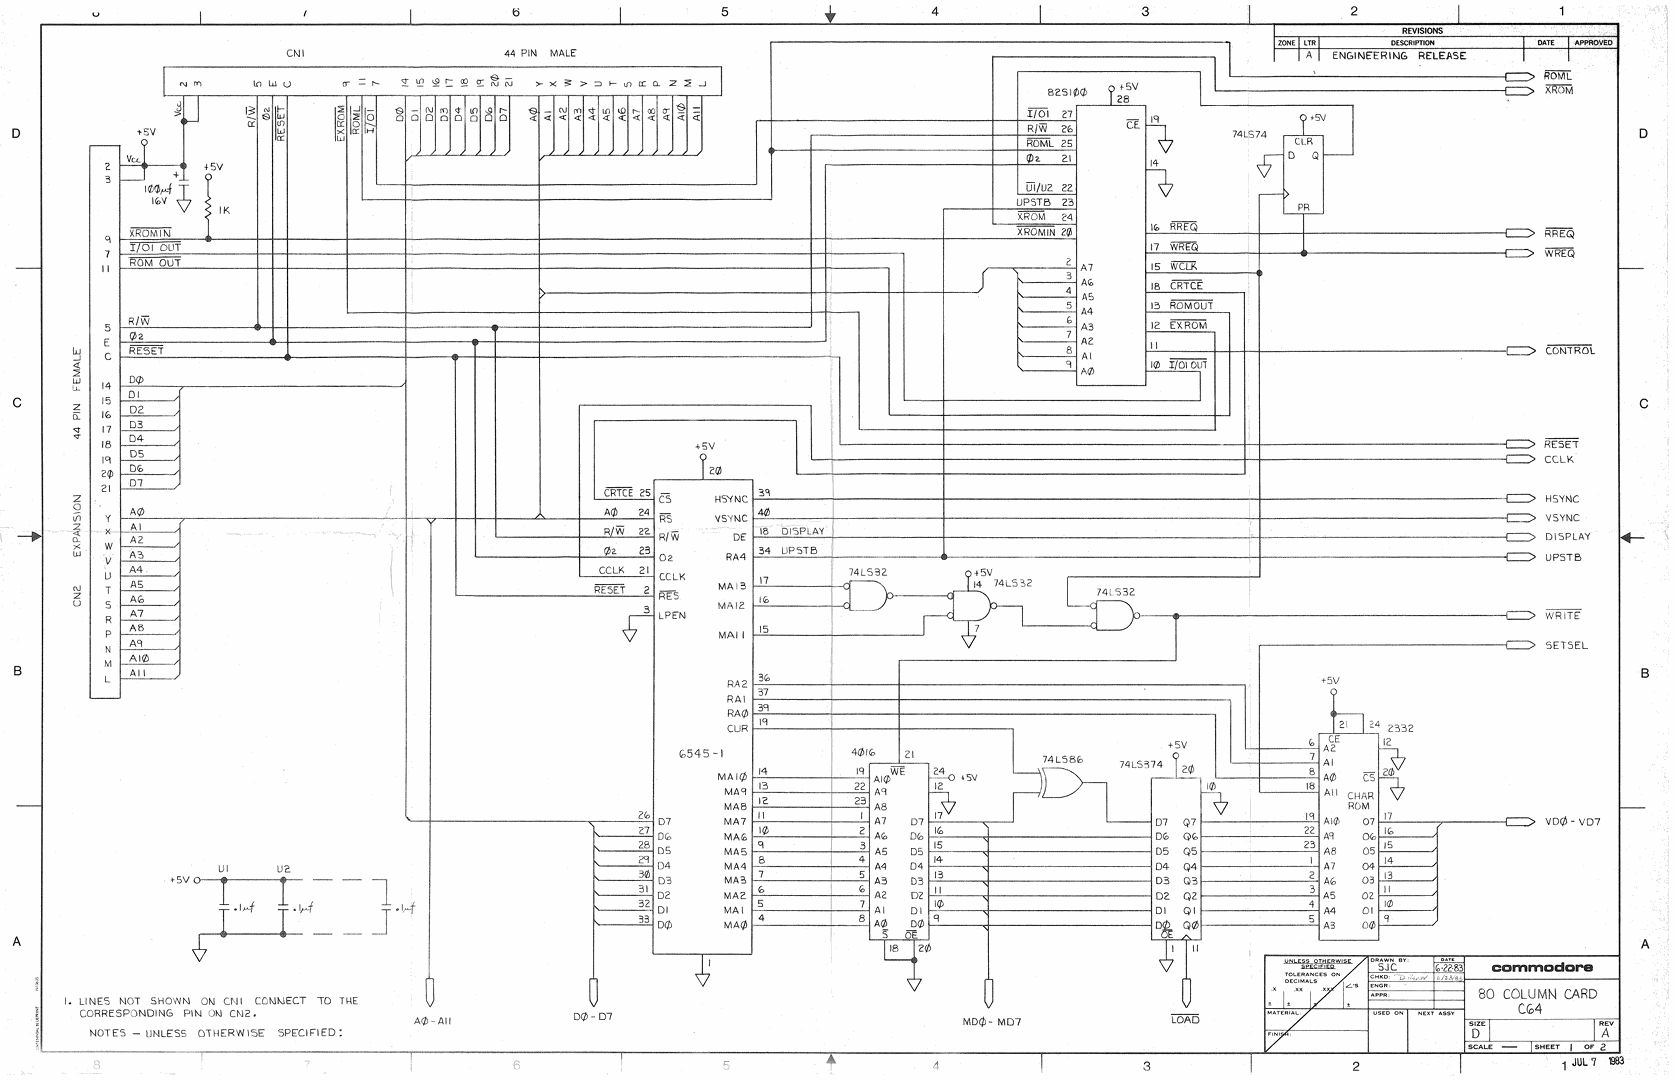 Commodore C64 80 Column Adapter